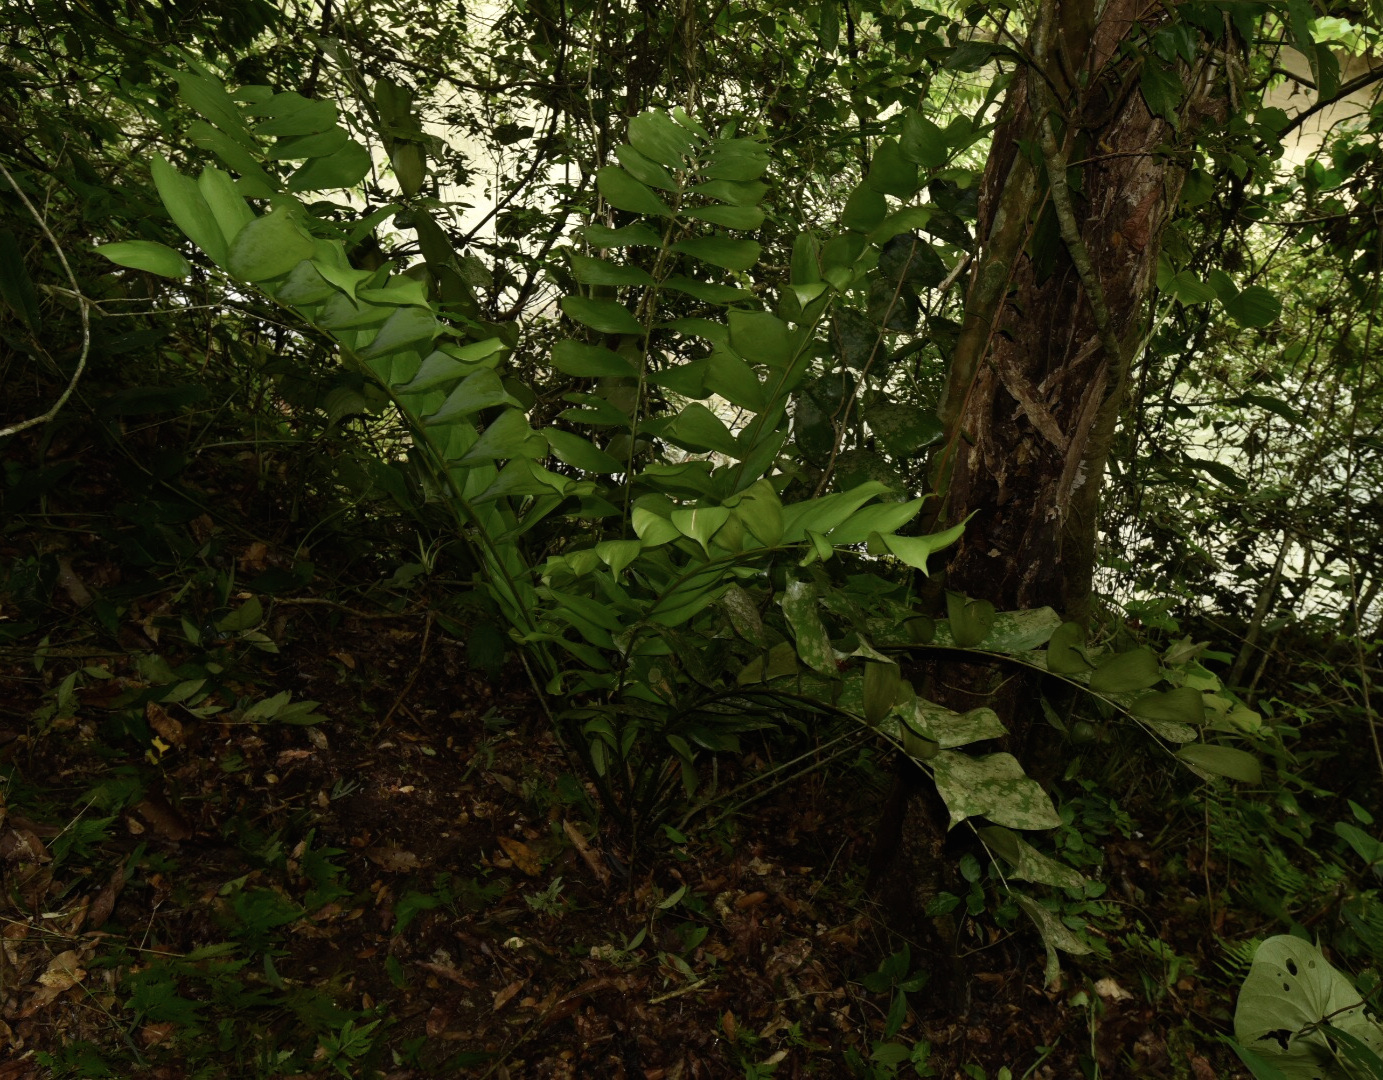 A mature  Ceratozama hondurensis  in nature, Caribbean lowlands of northern Honduras. Image: F. Muller.